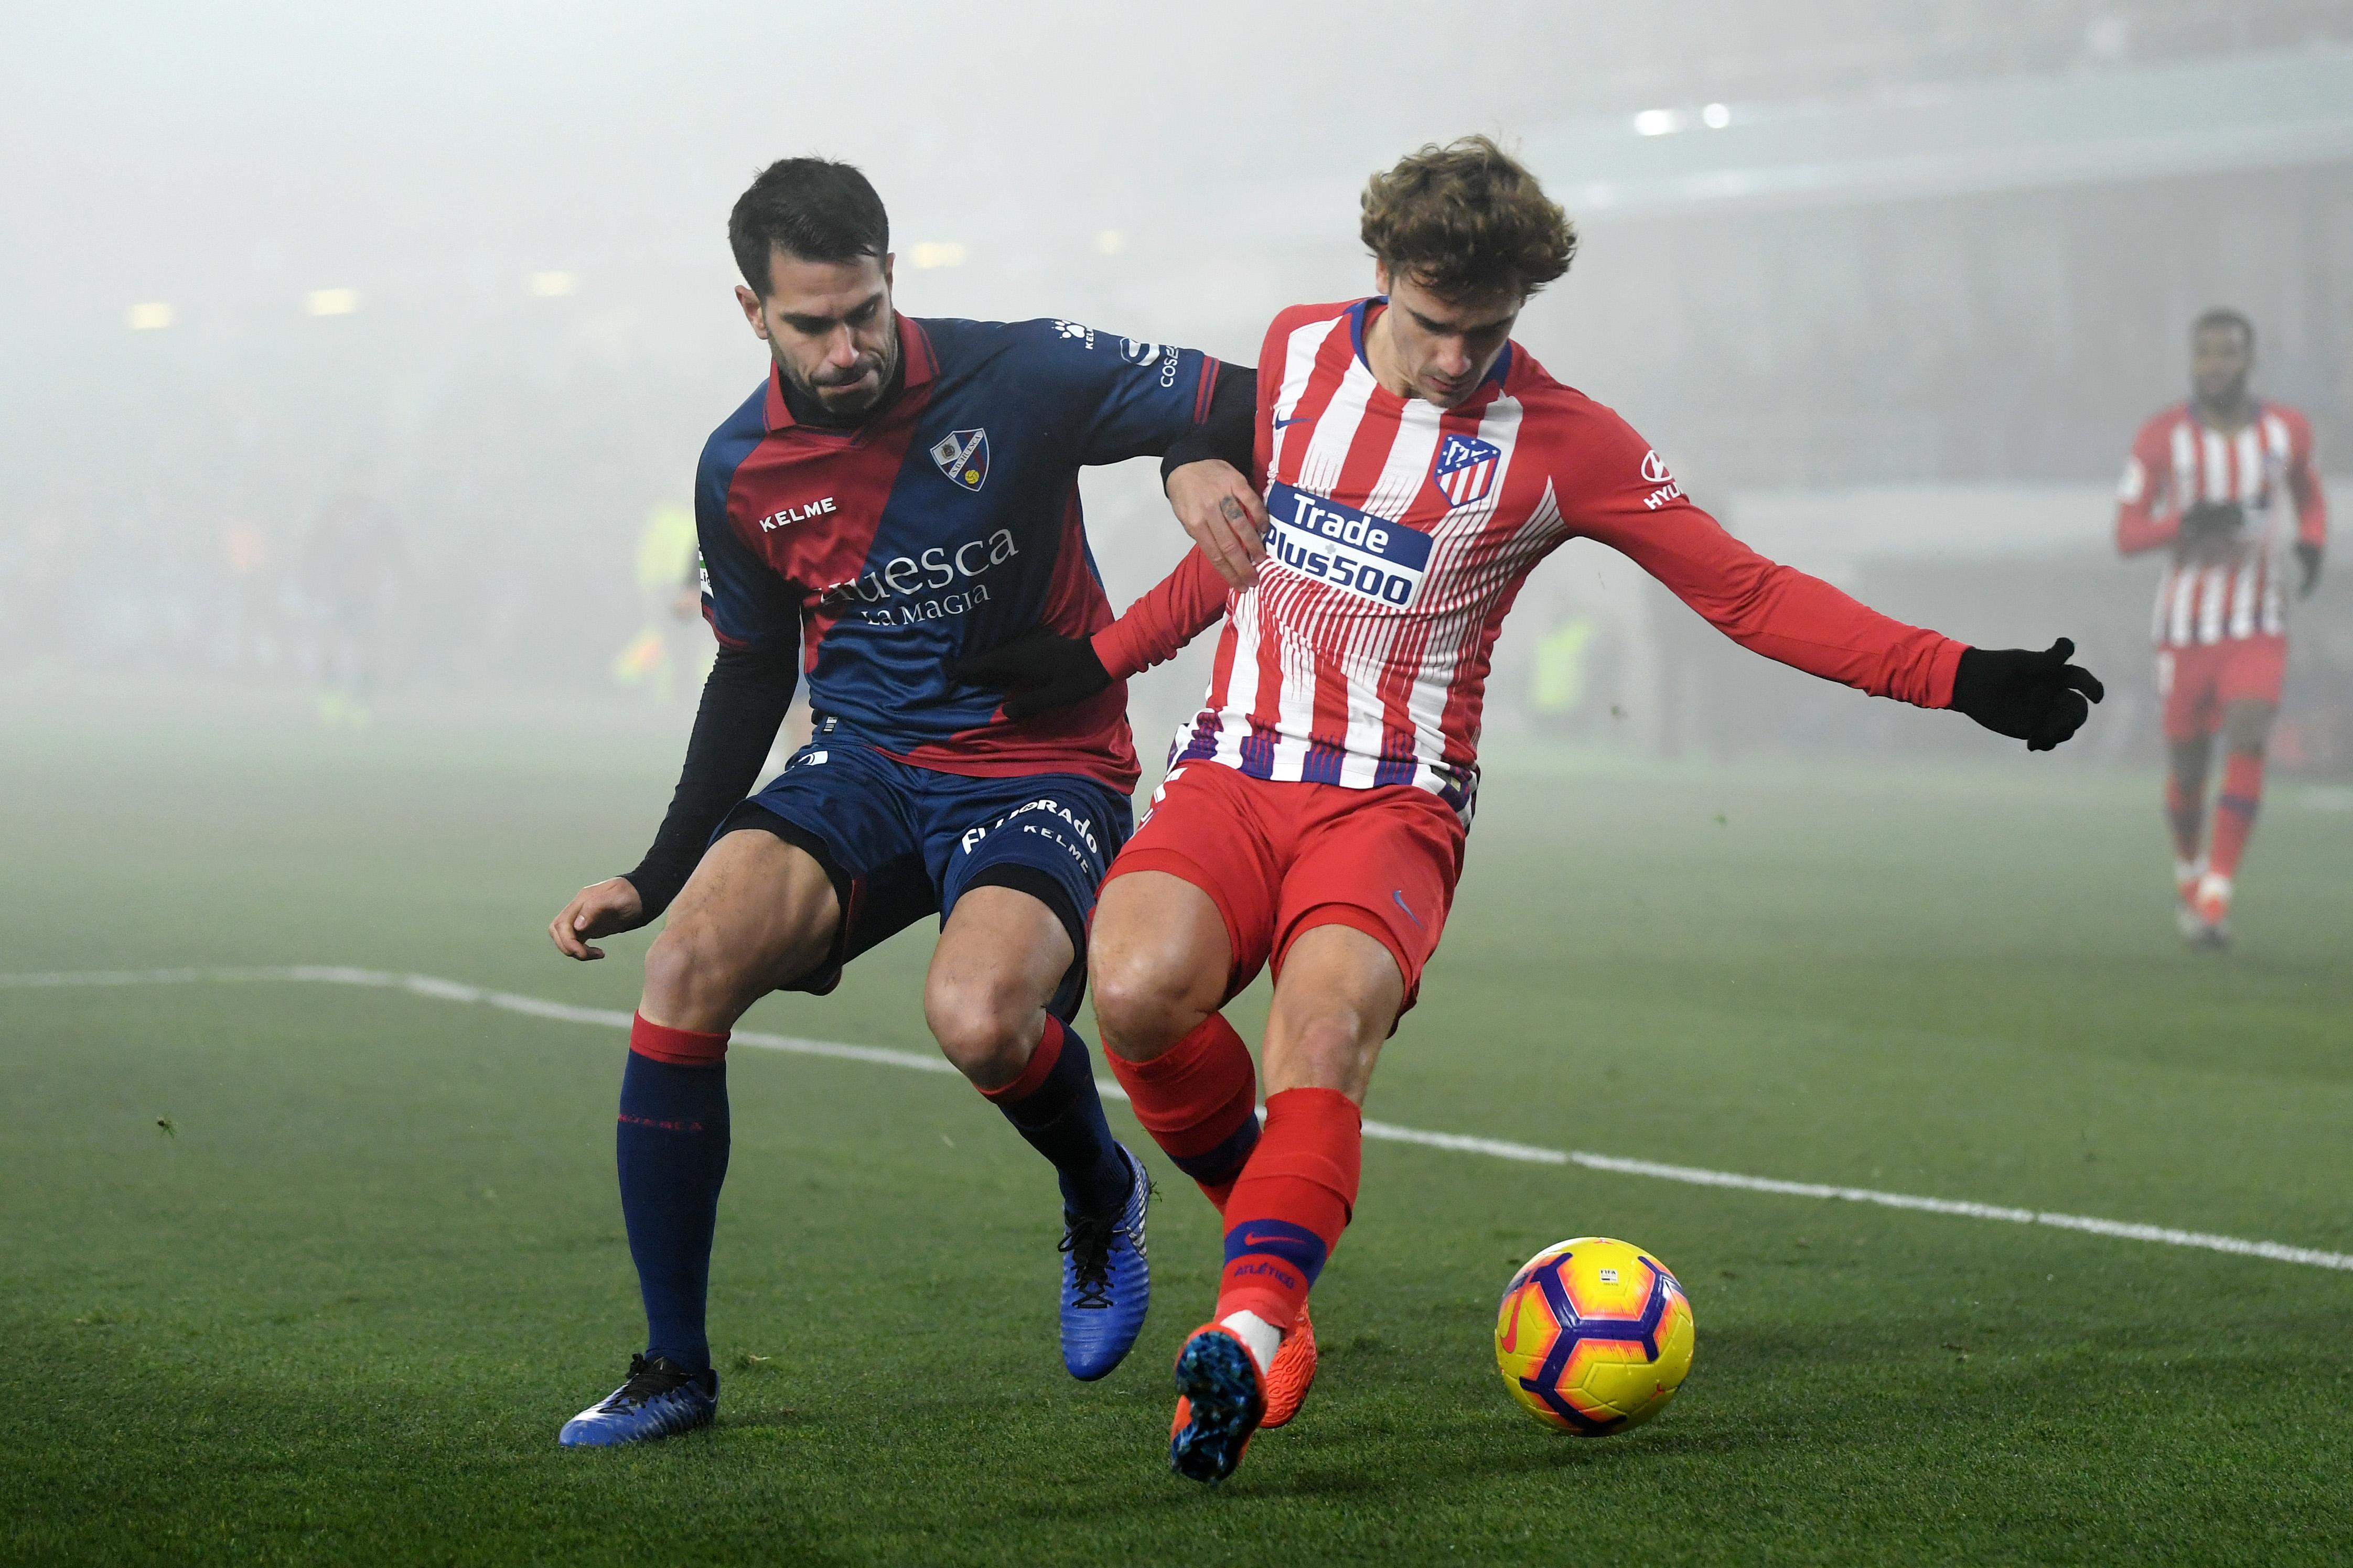 Huesca v Atletico Madrid La Liga 2018-19